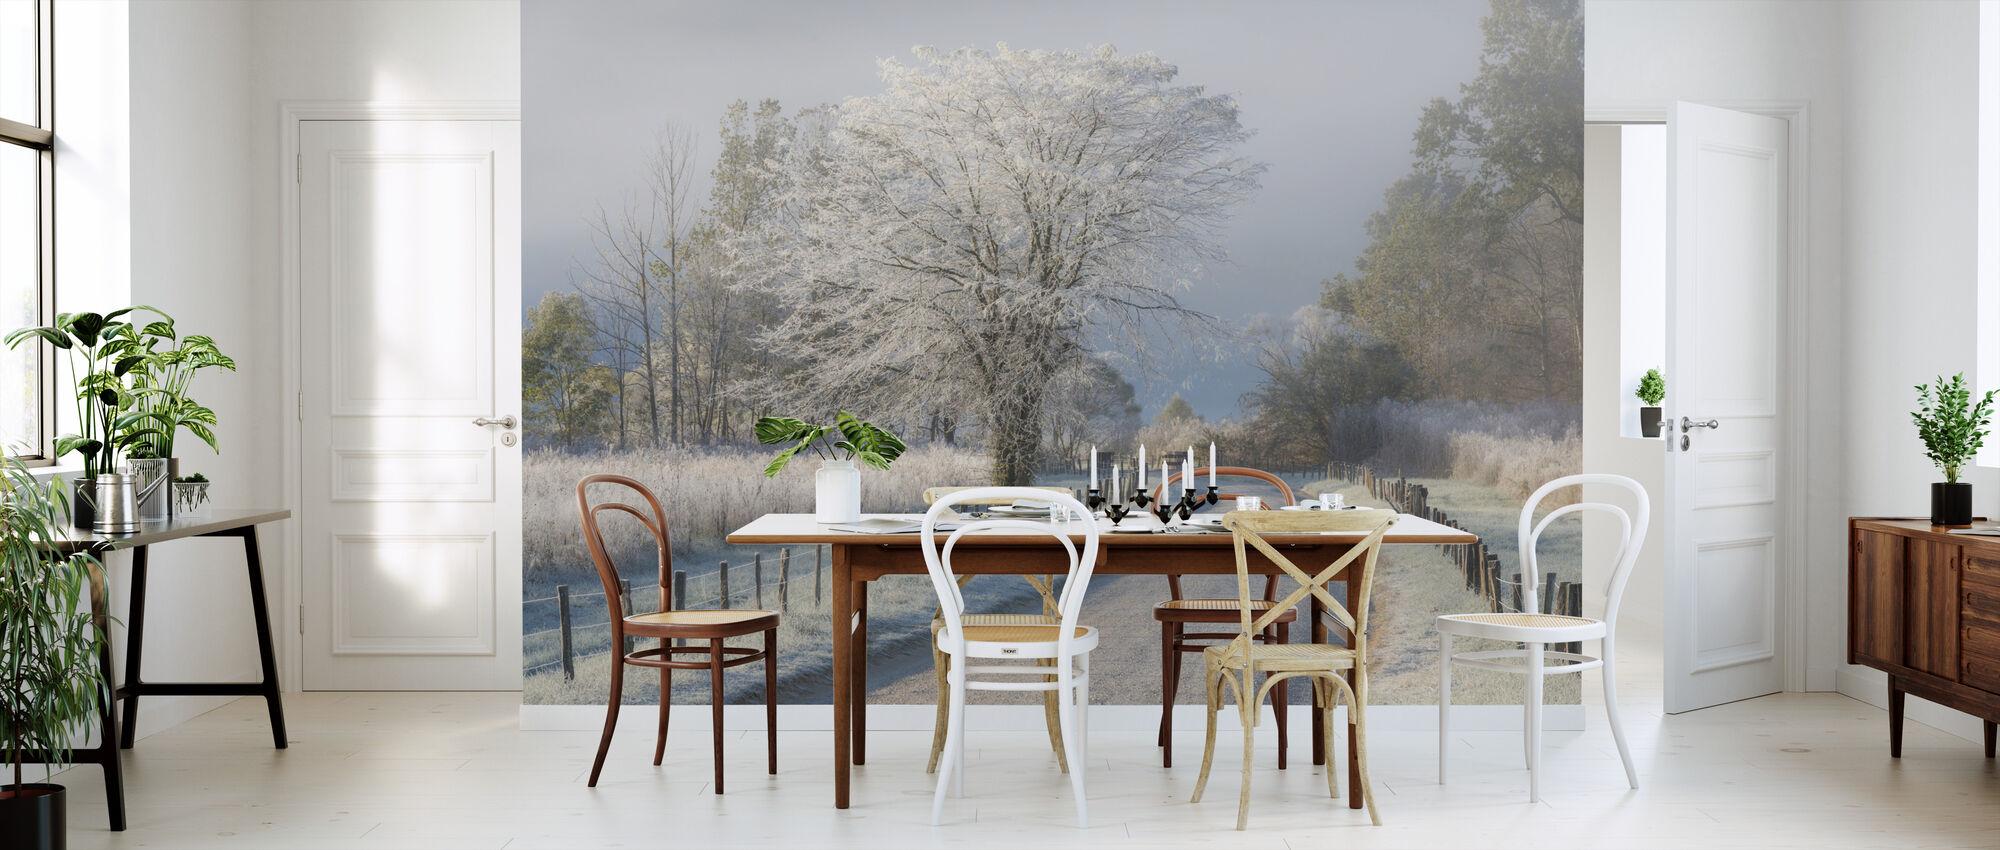 Frosty ochtend - Behang - Keuken